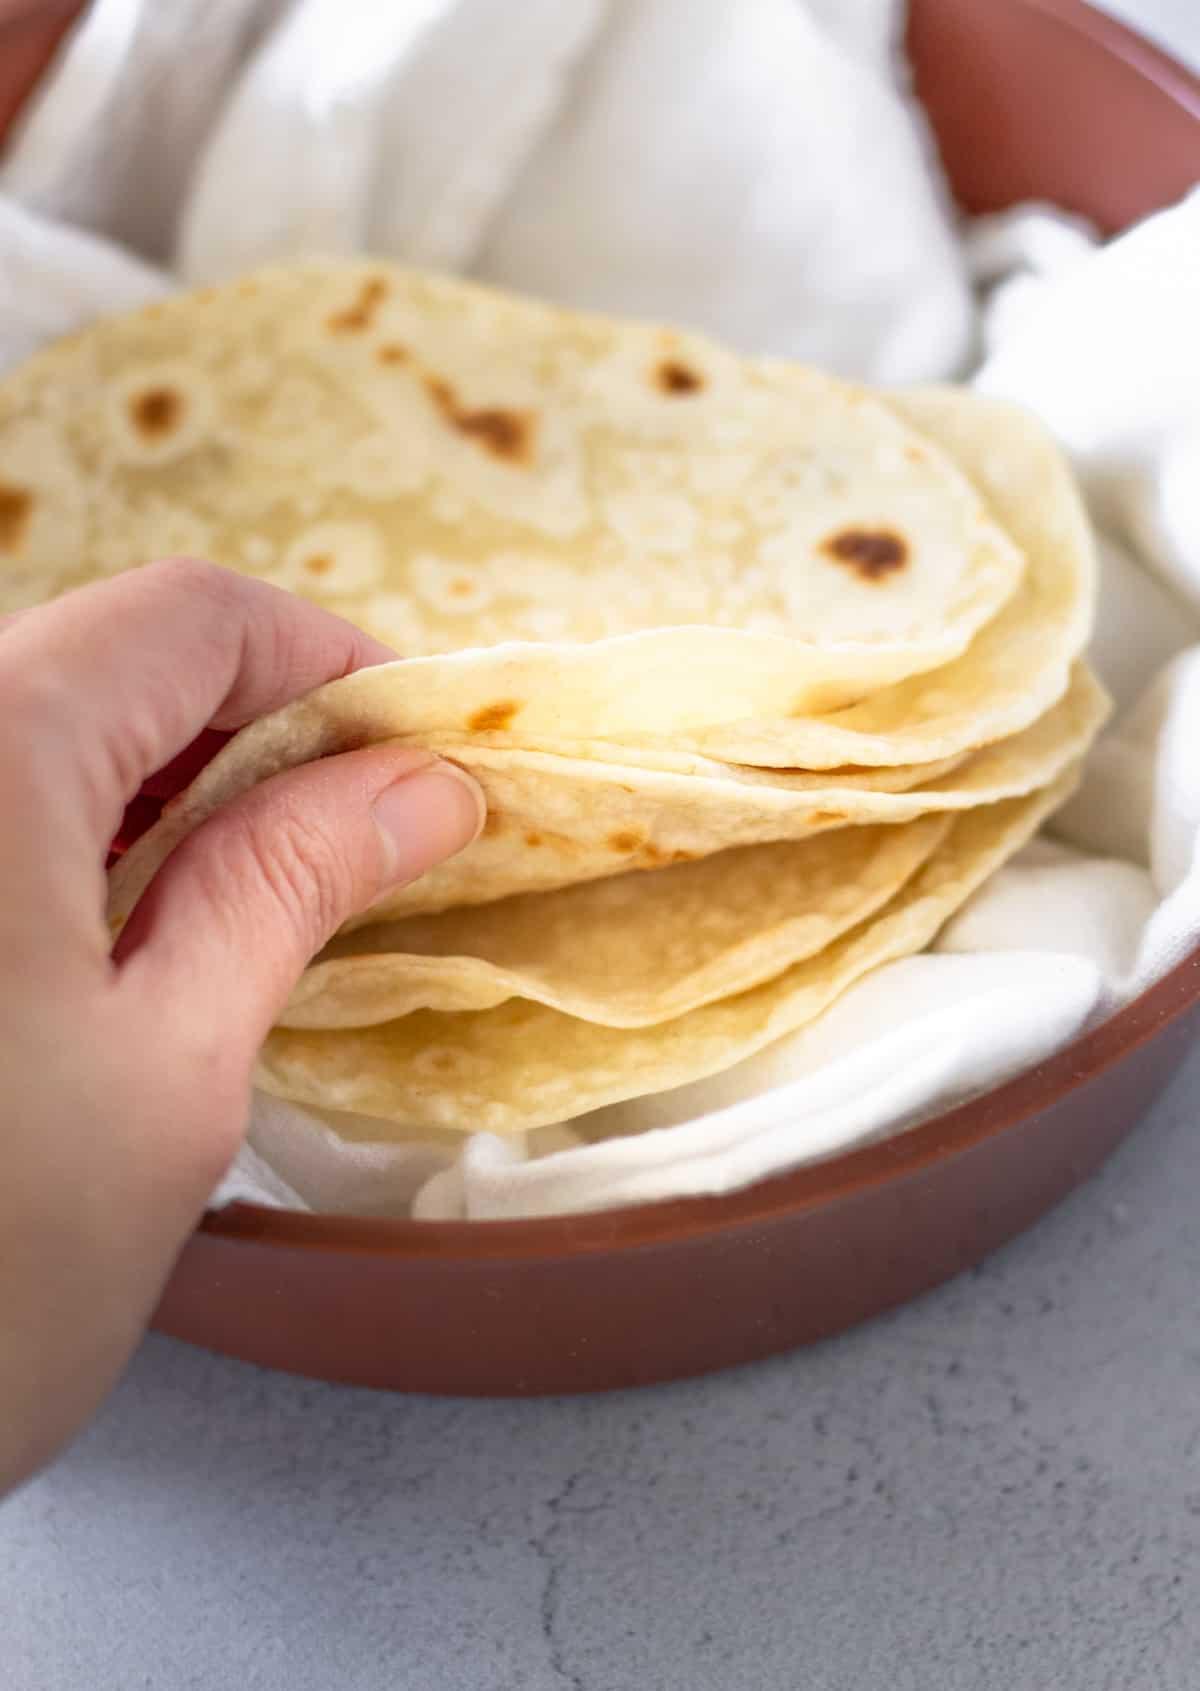 Hand holding tortillas inside the warmer.